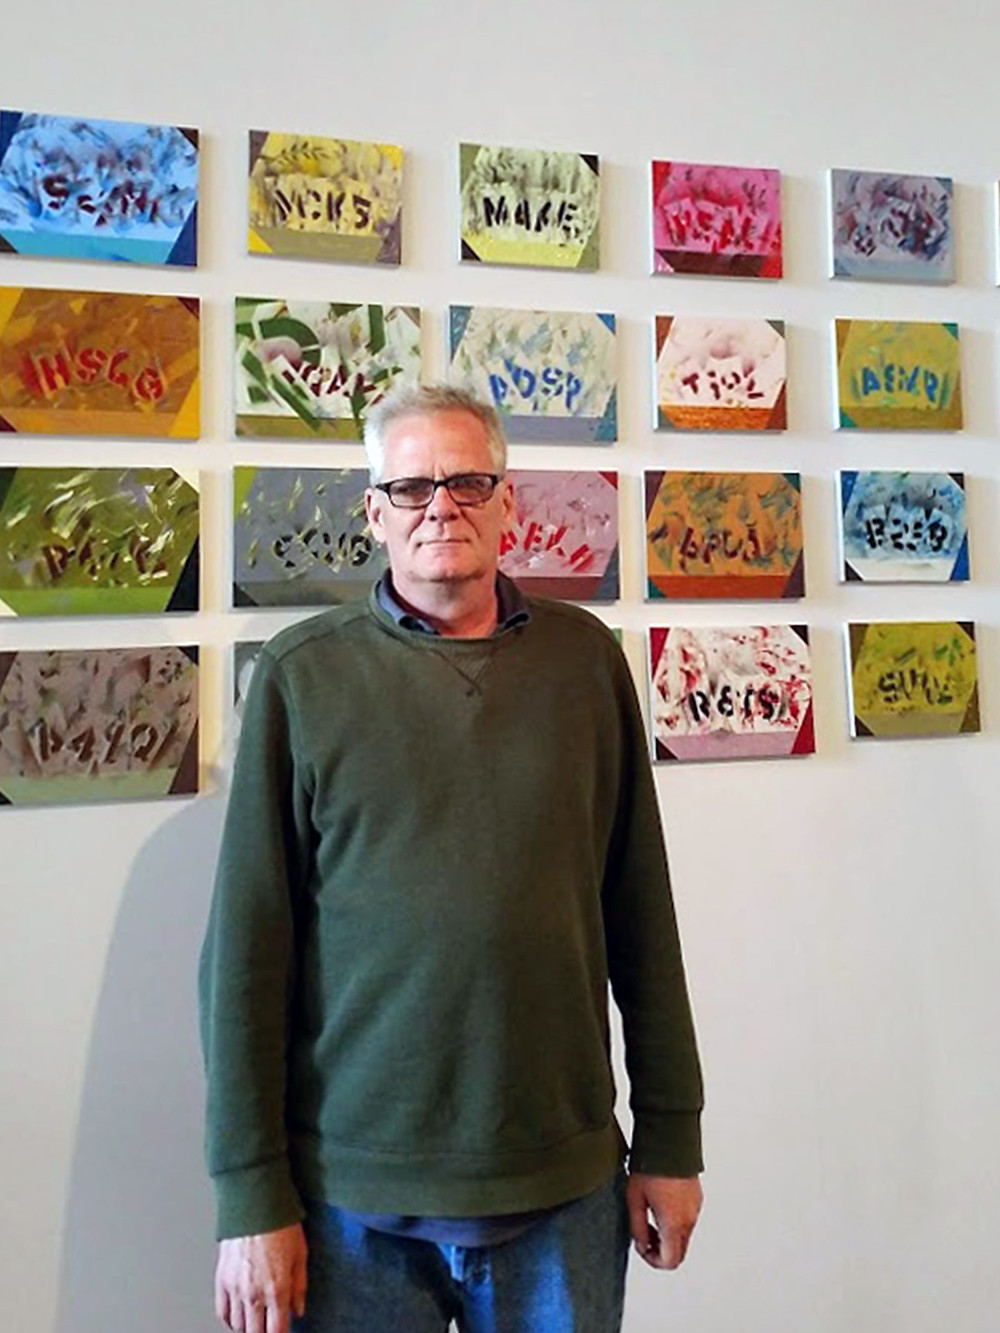 Trip Denton in front of his art work at Side Street Gallery, Philadelphia.